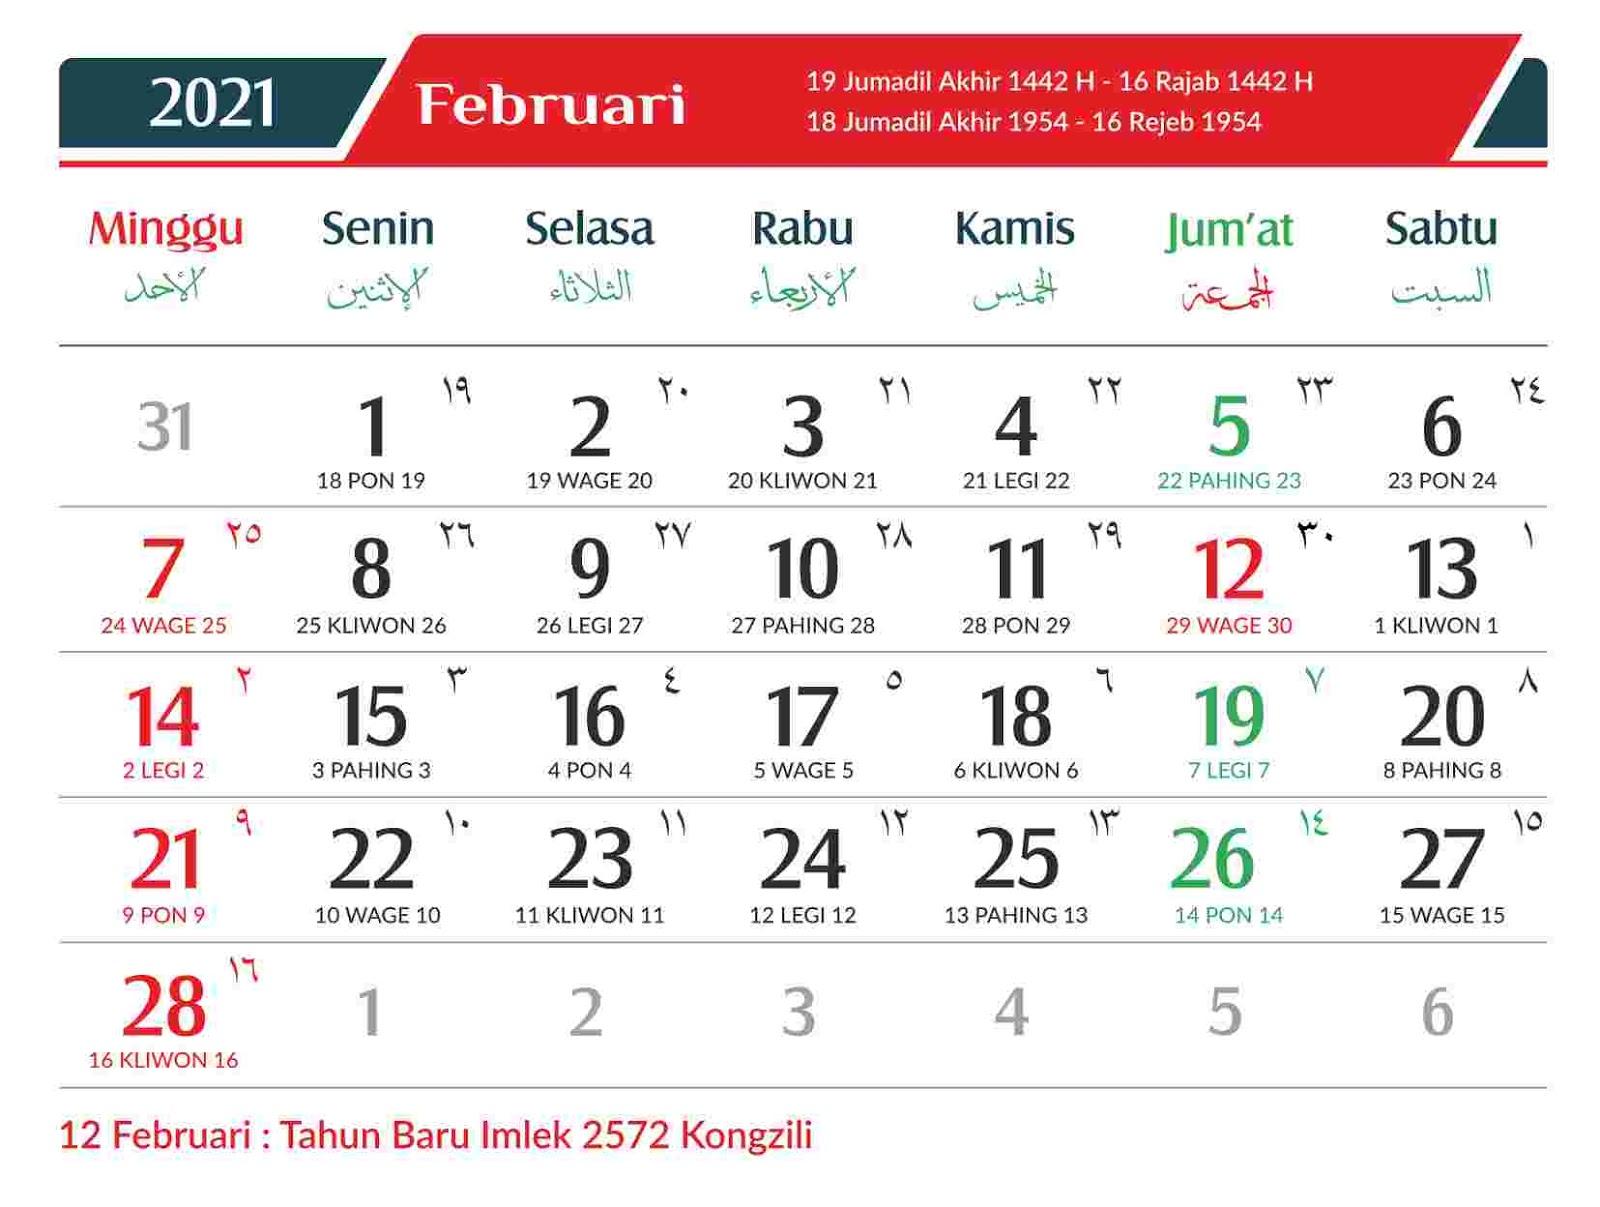 Download 48+ View Template Kalender 2021 Lengkap Images cdr